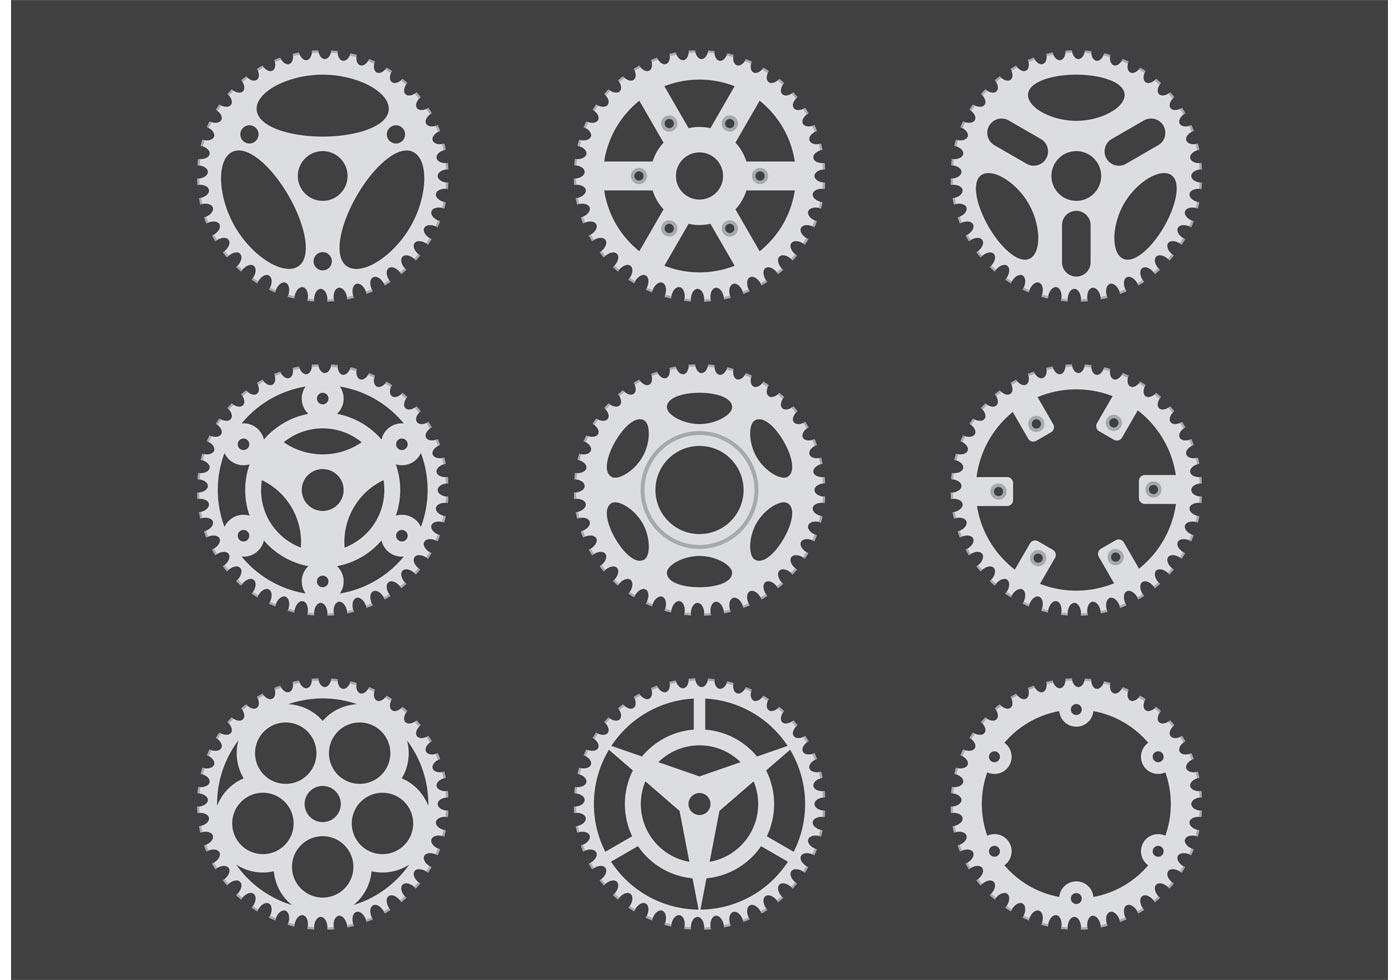 bicycle free wheel sprocket mechanism pdf